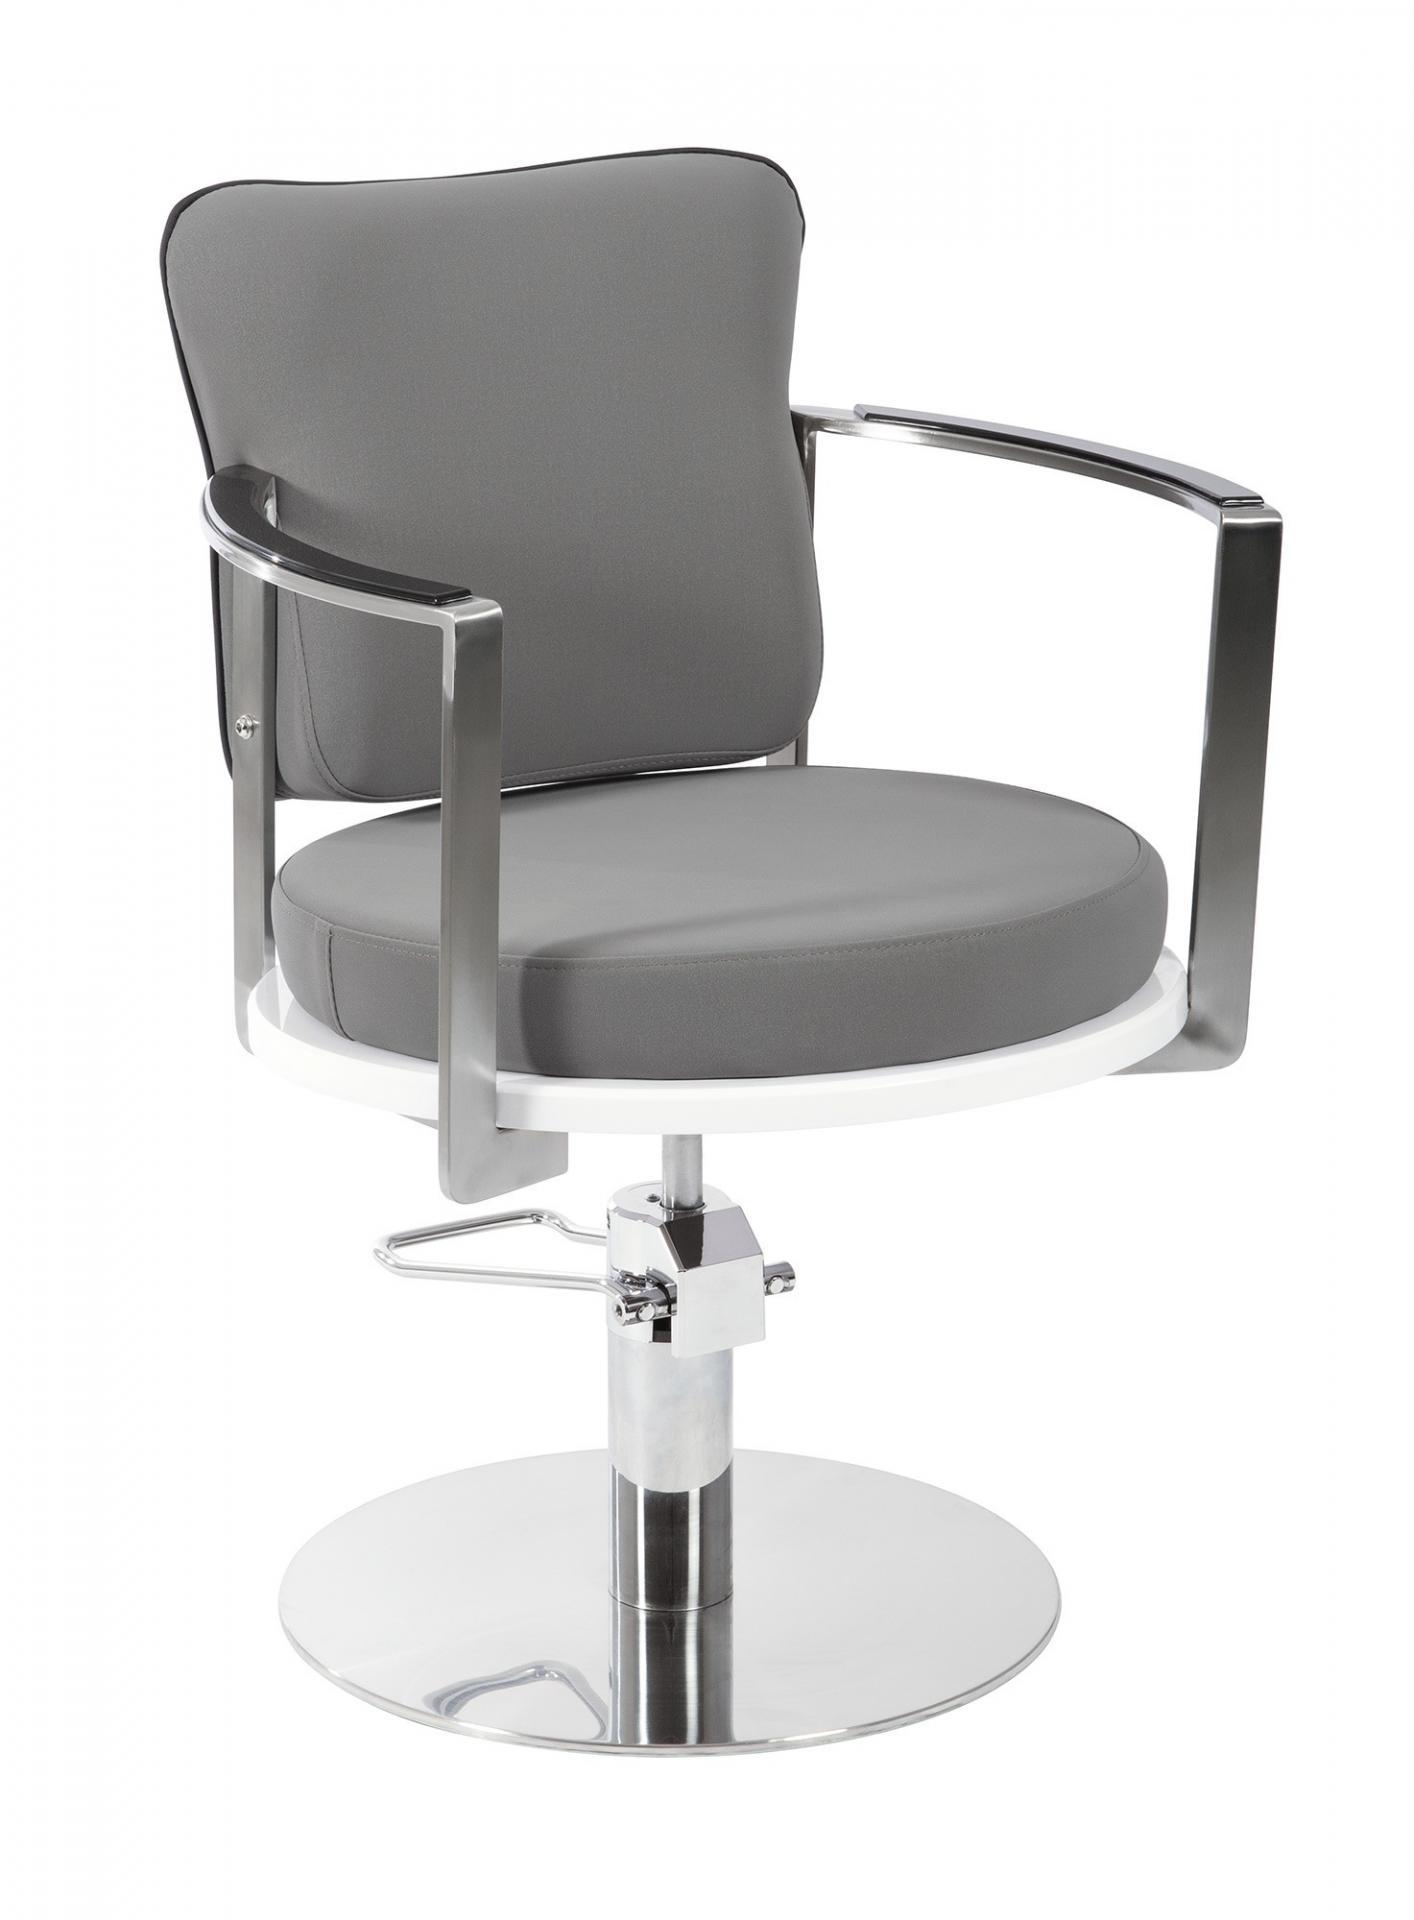 sillón DULAIN